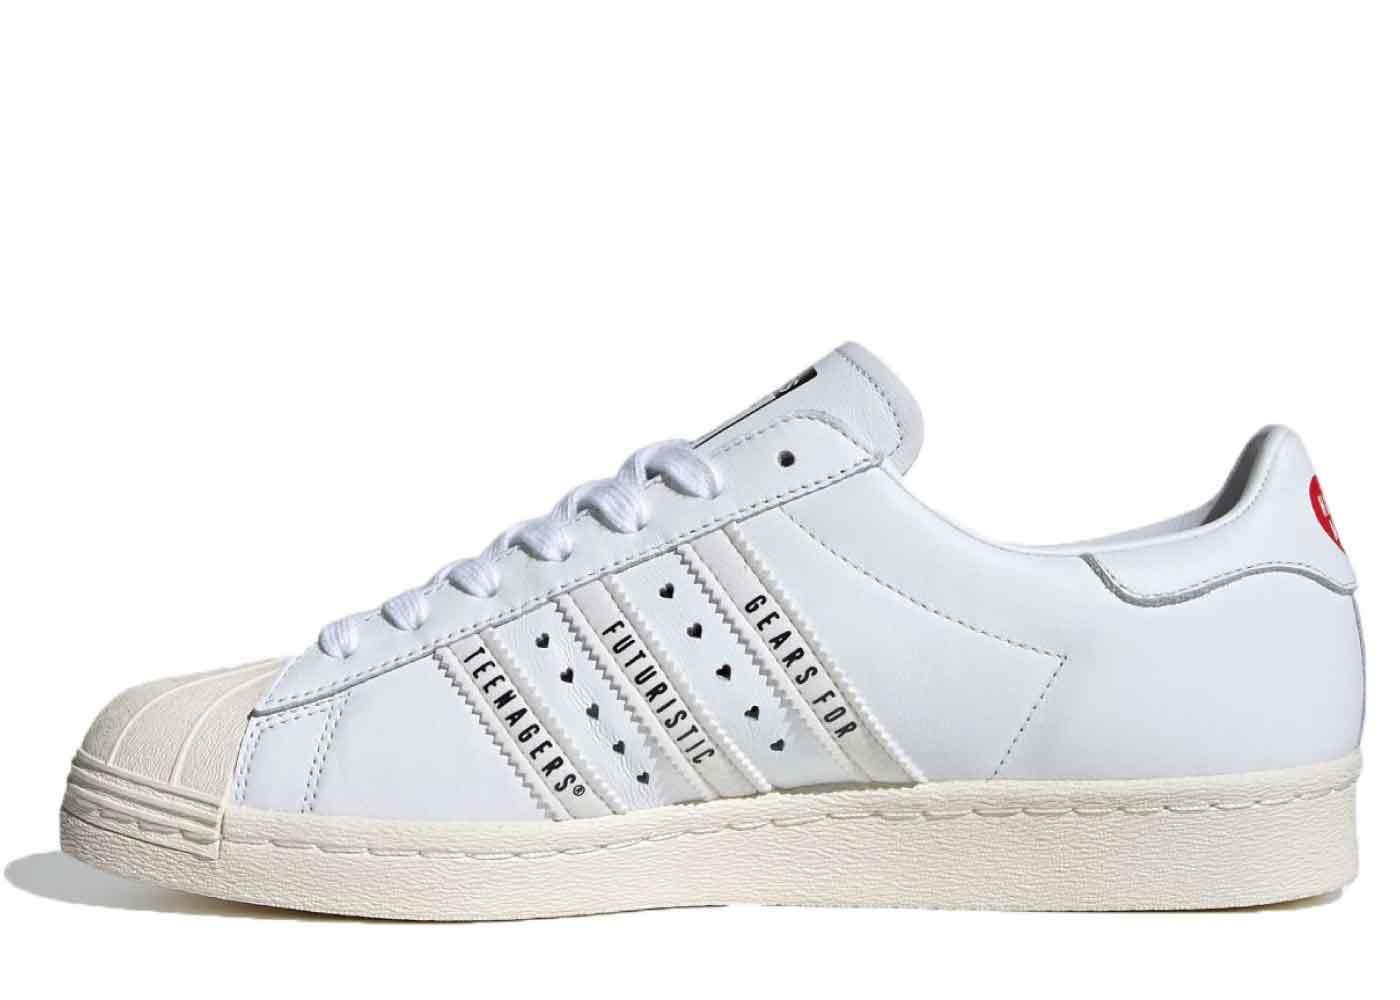 Human Made × Adidas Superstar 80s White Sailの写真